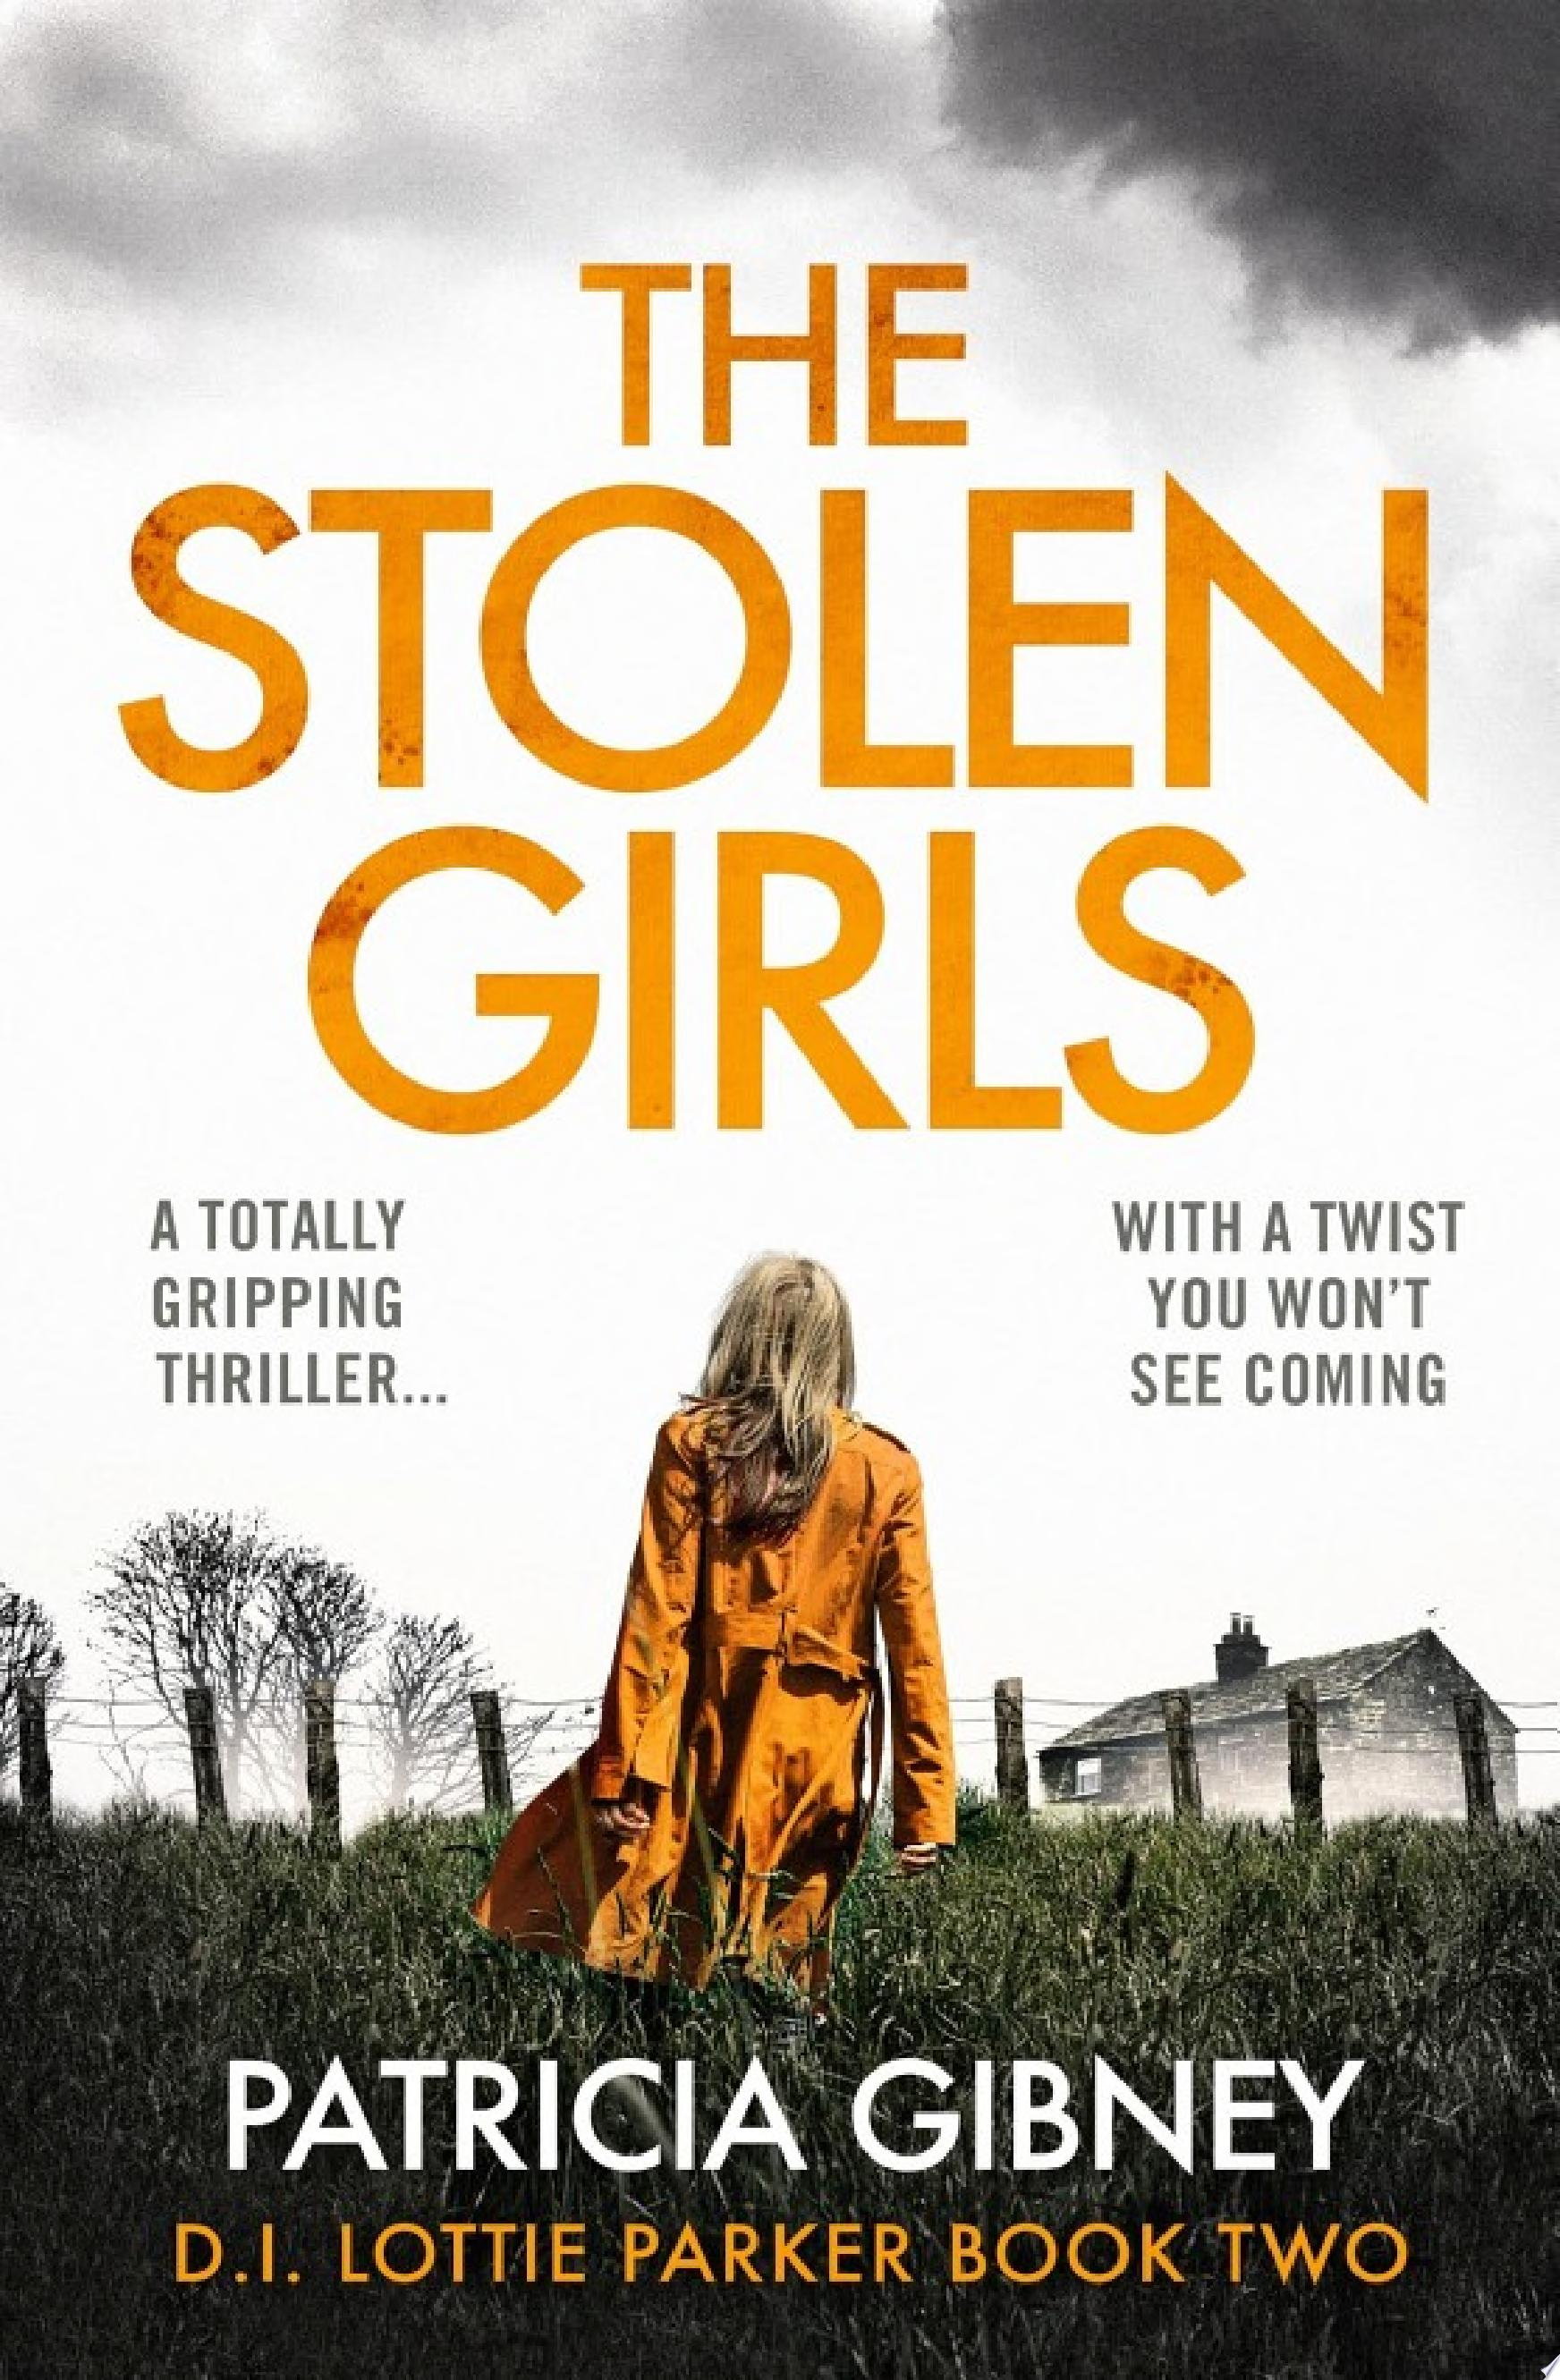 The Stolen Girls